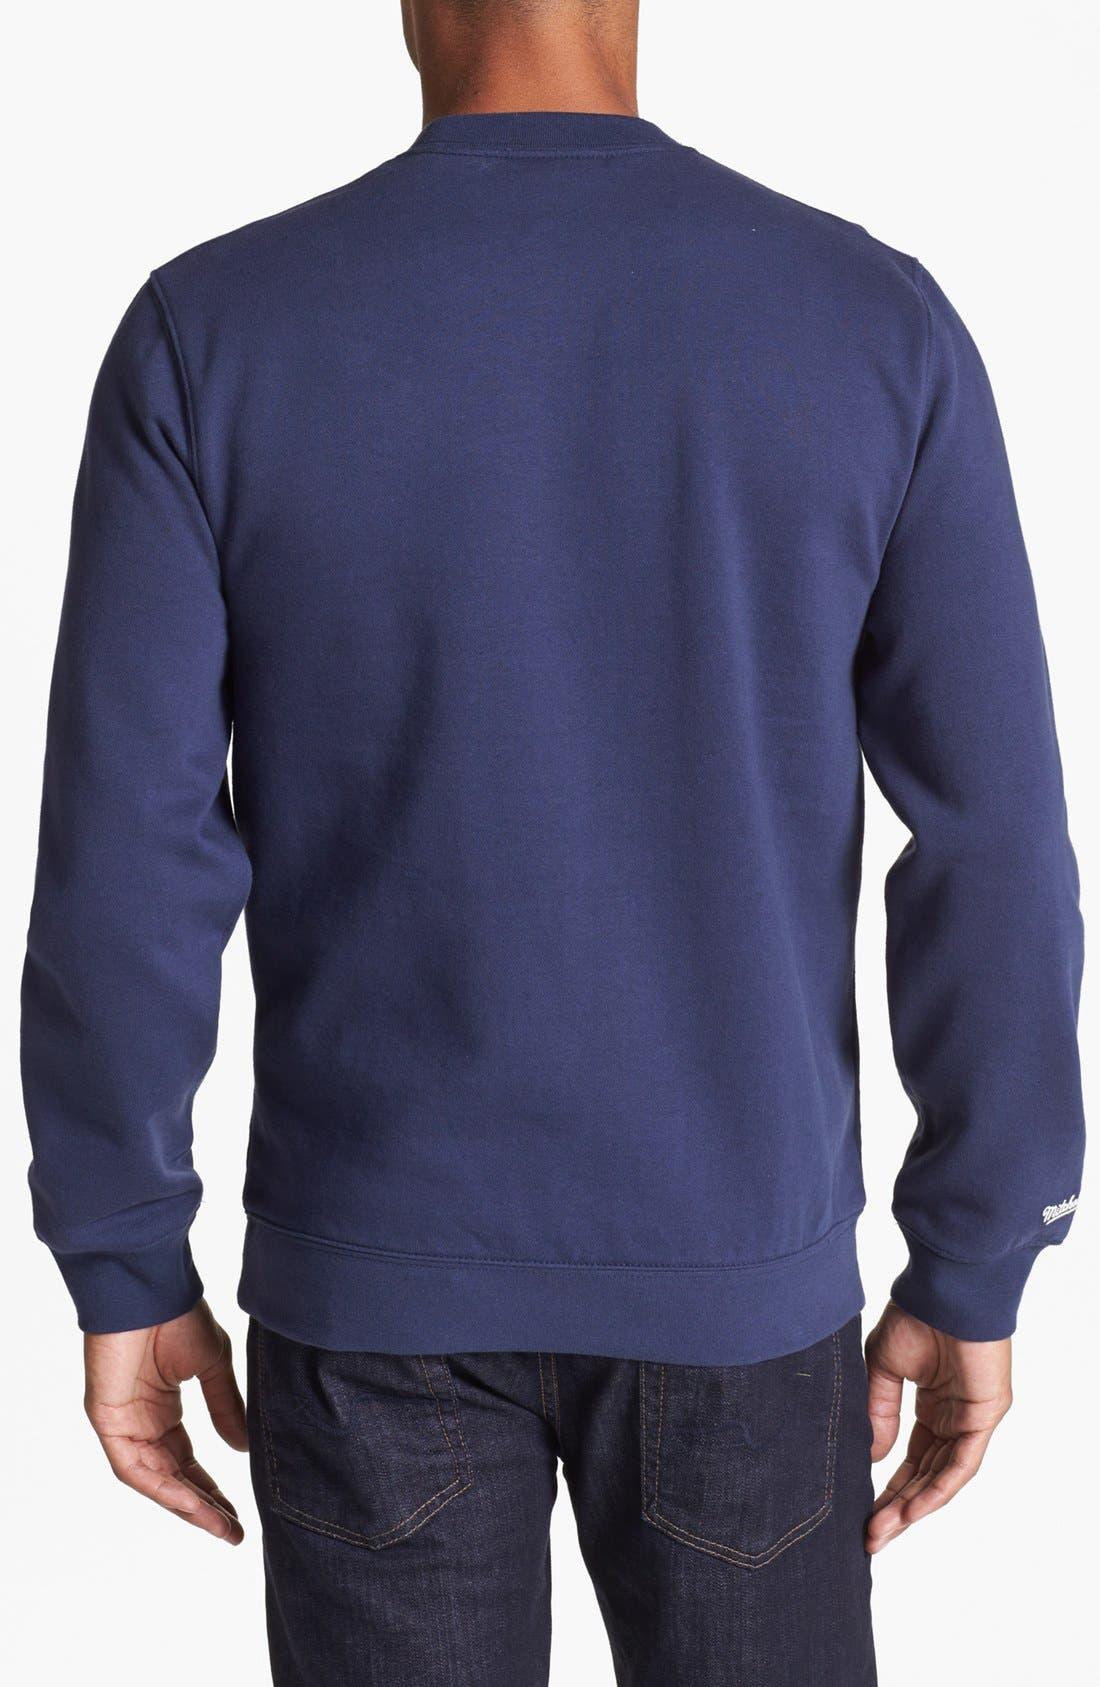 Alternate Image 2  - Mitchell & Ness 'Syracuse' Sweatshirt